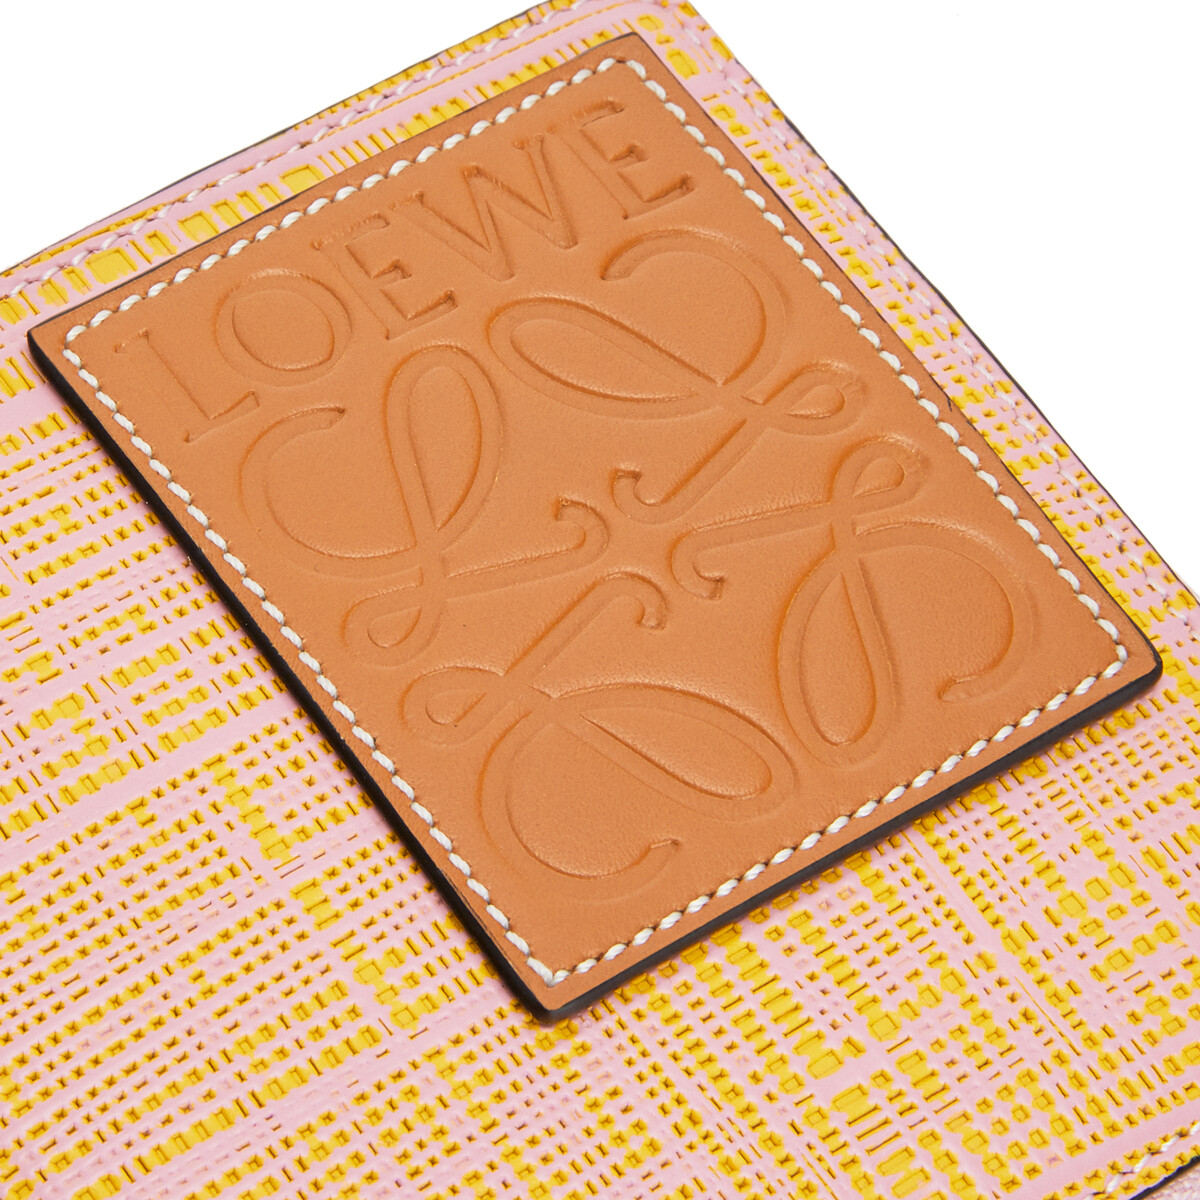 LOEWE 方形拉链钱包 Yellow/Pink front